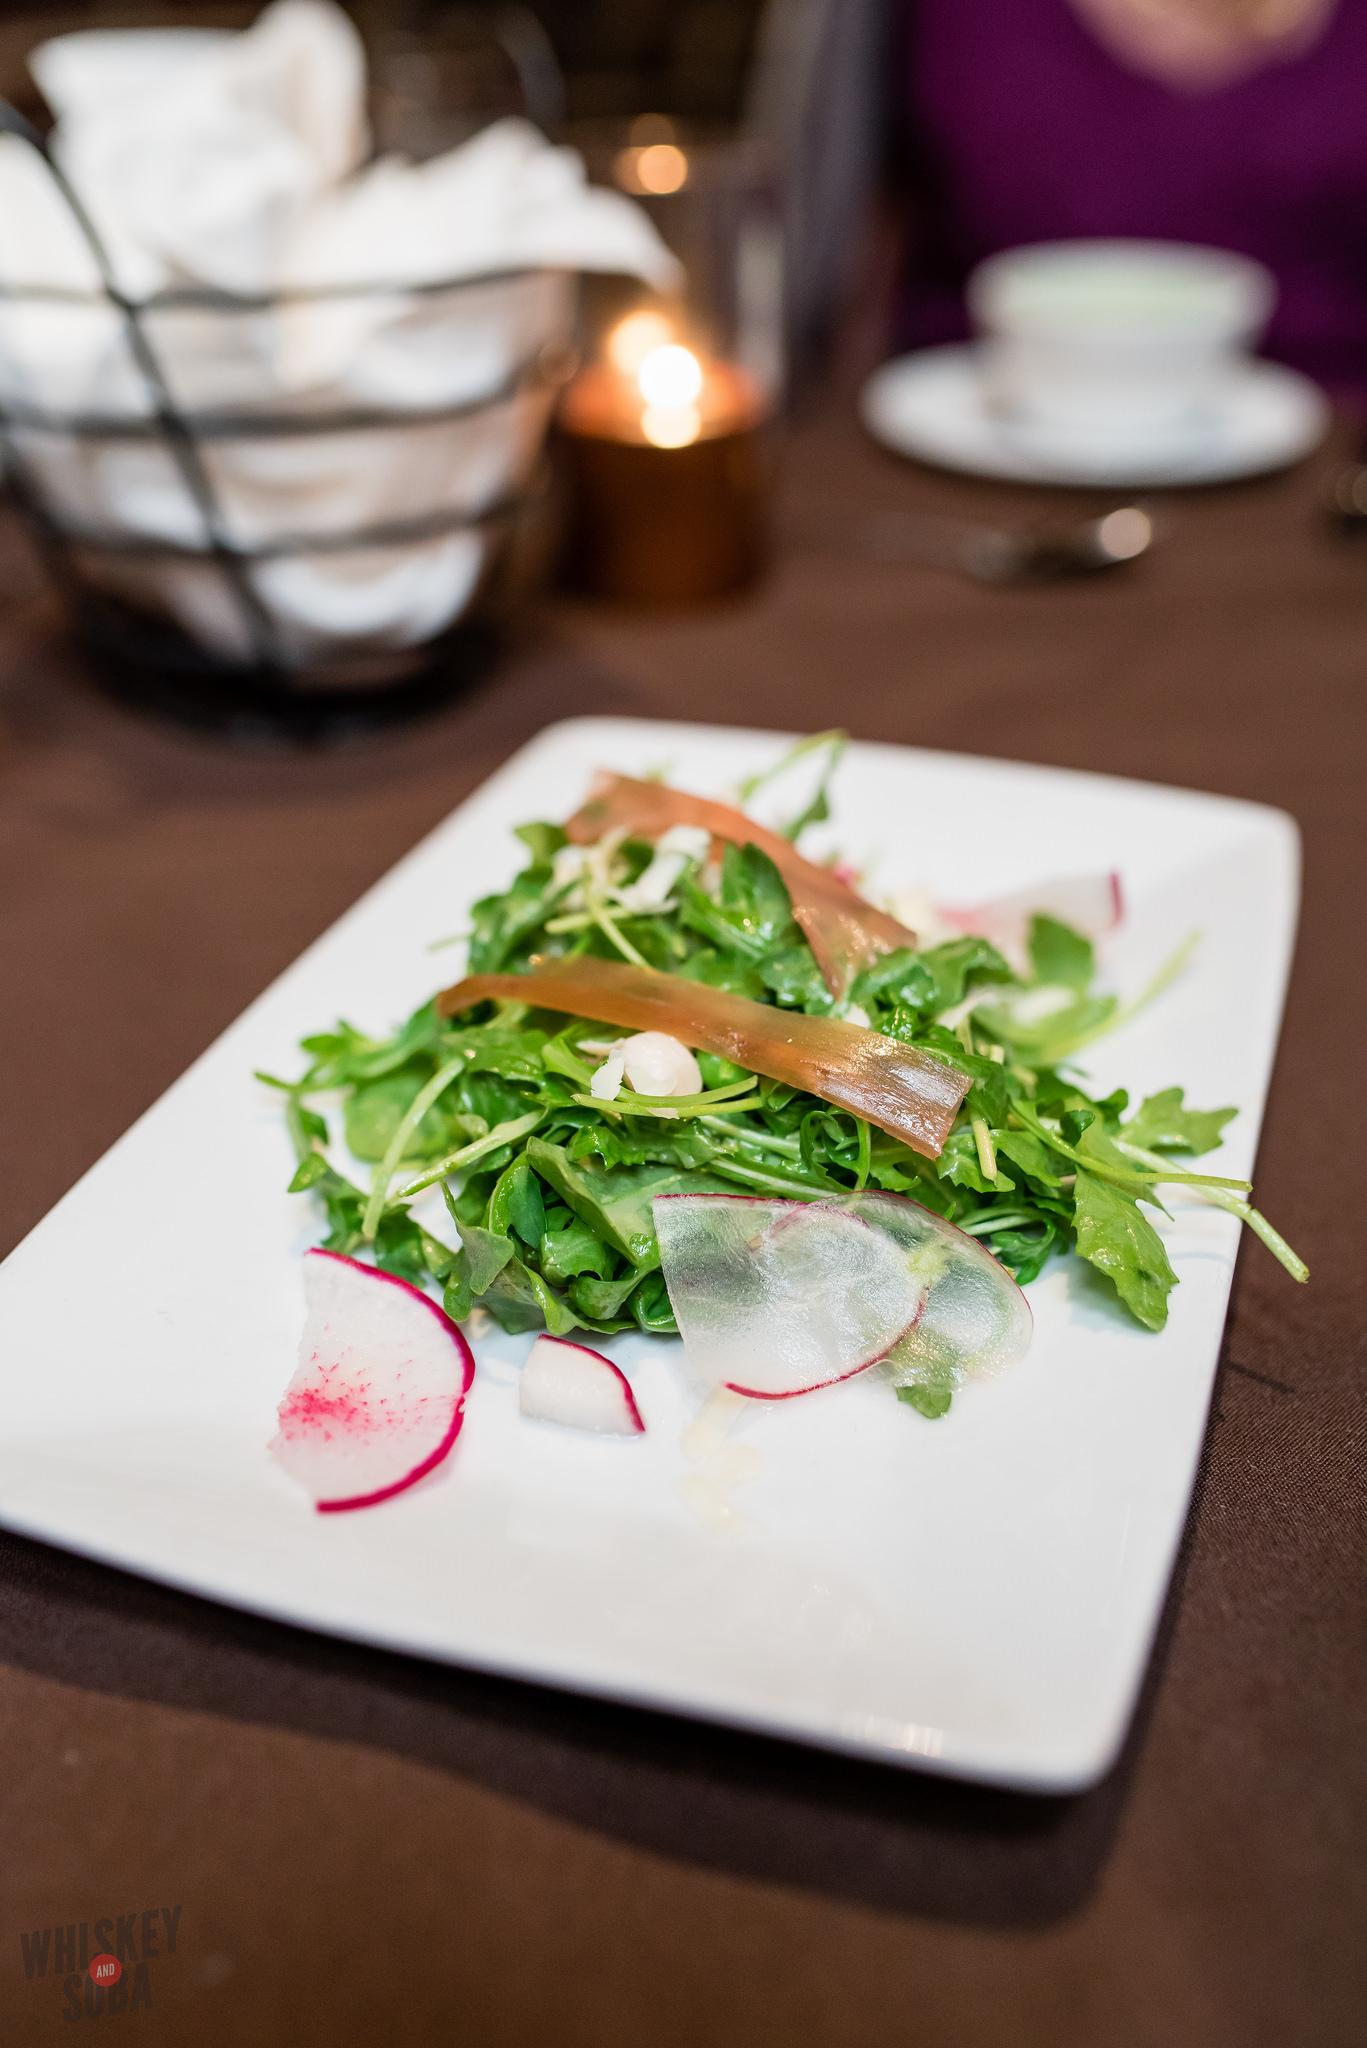 Chimichurri Salad at Sidney Street Cafe